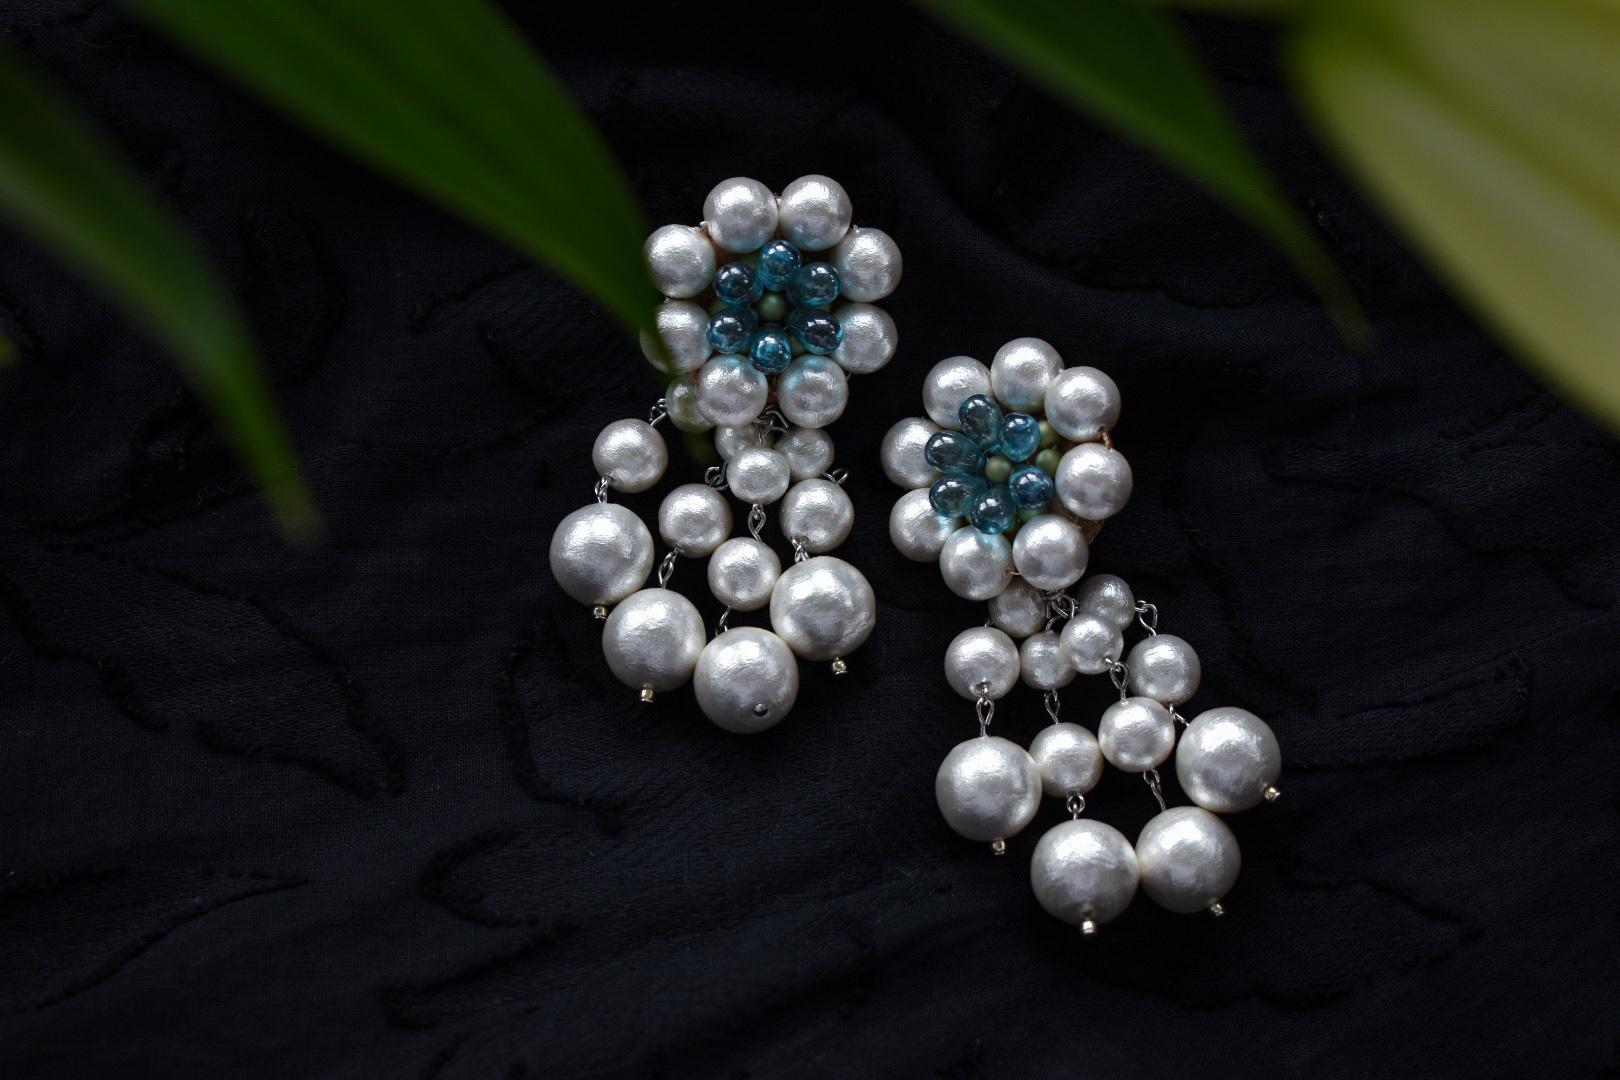 vyuha tsubaki cotton perl earring/pierce blue